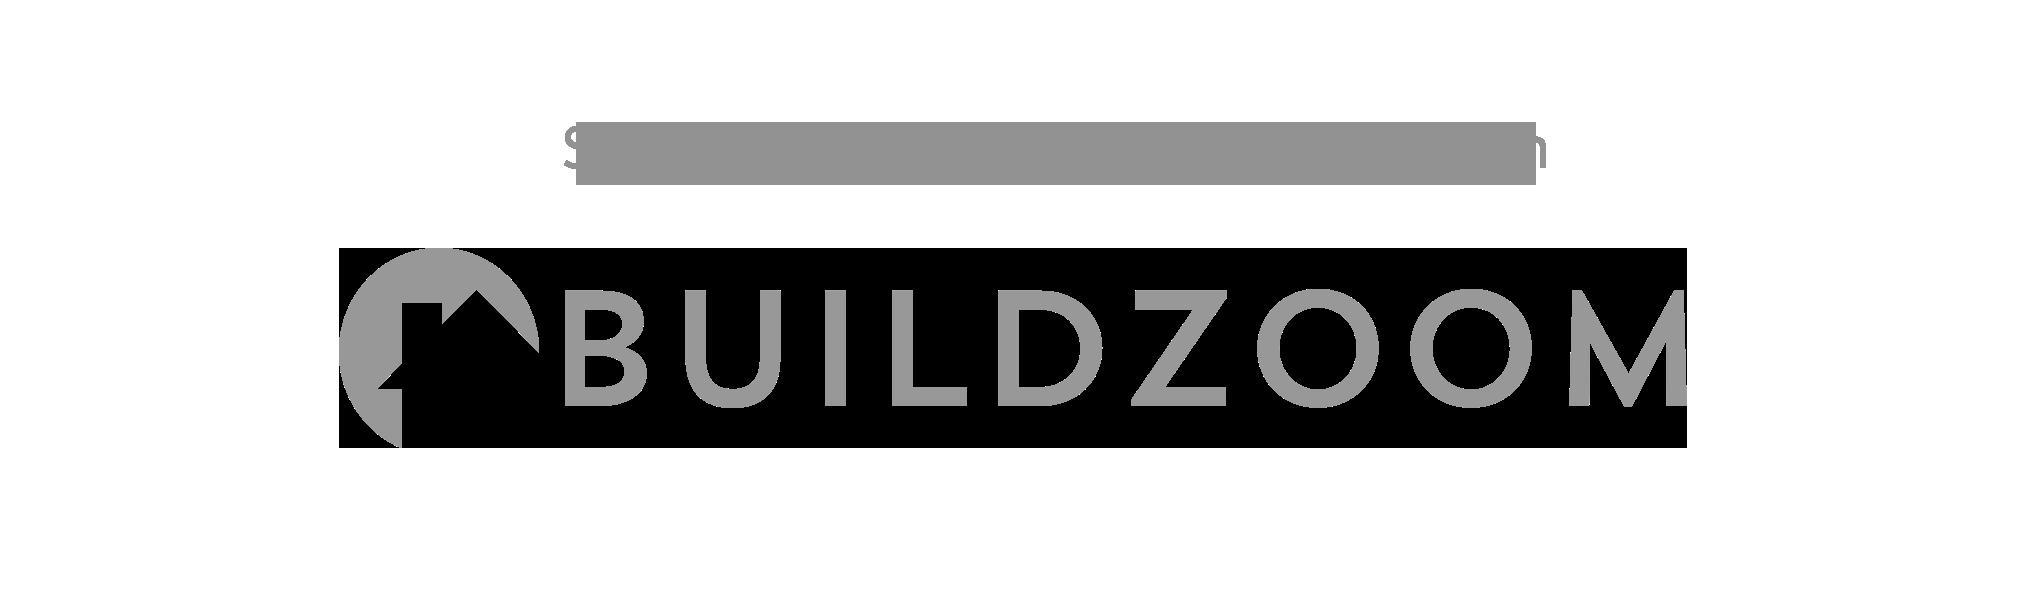 buildzoom2.png